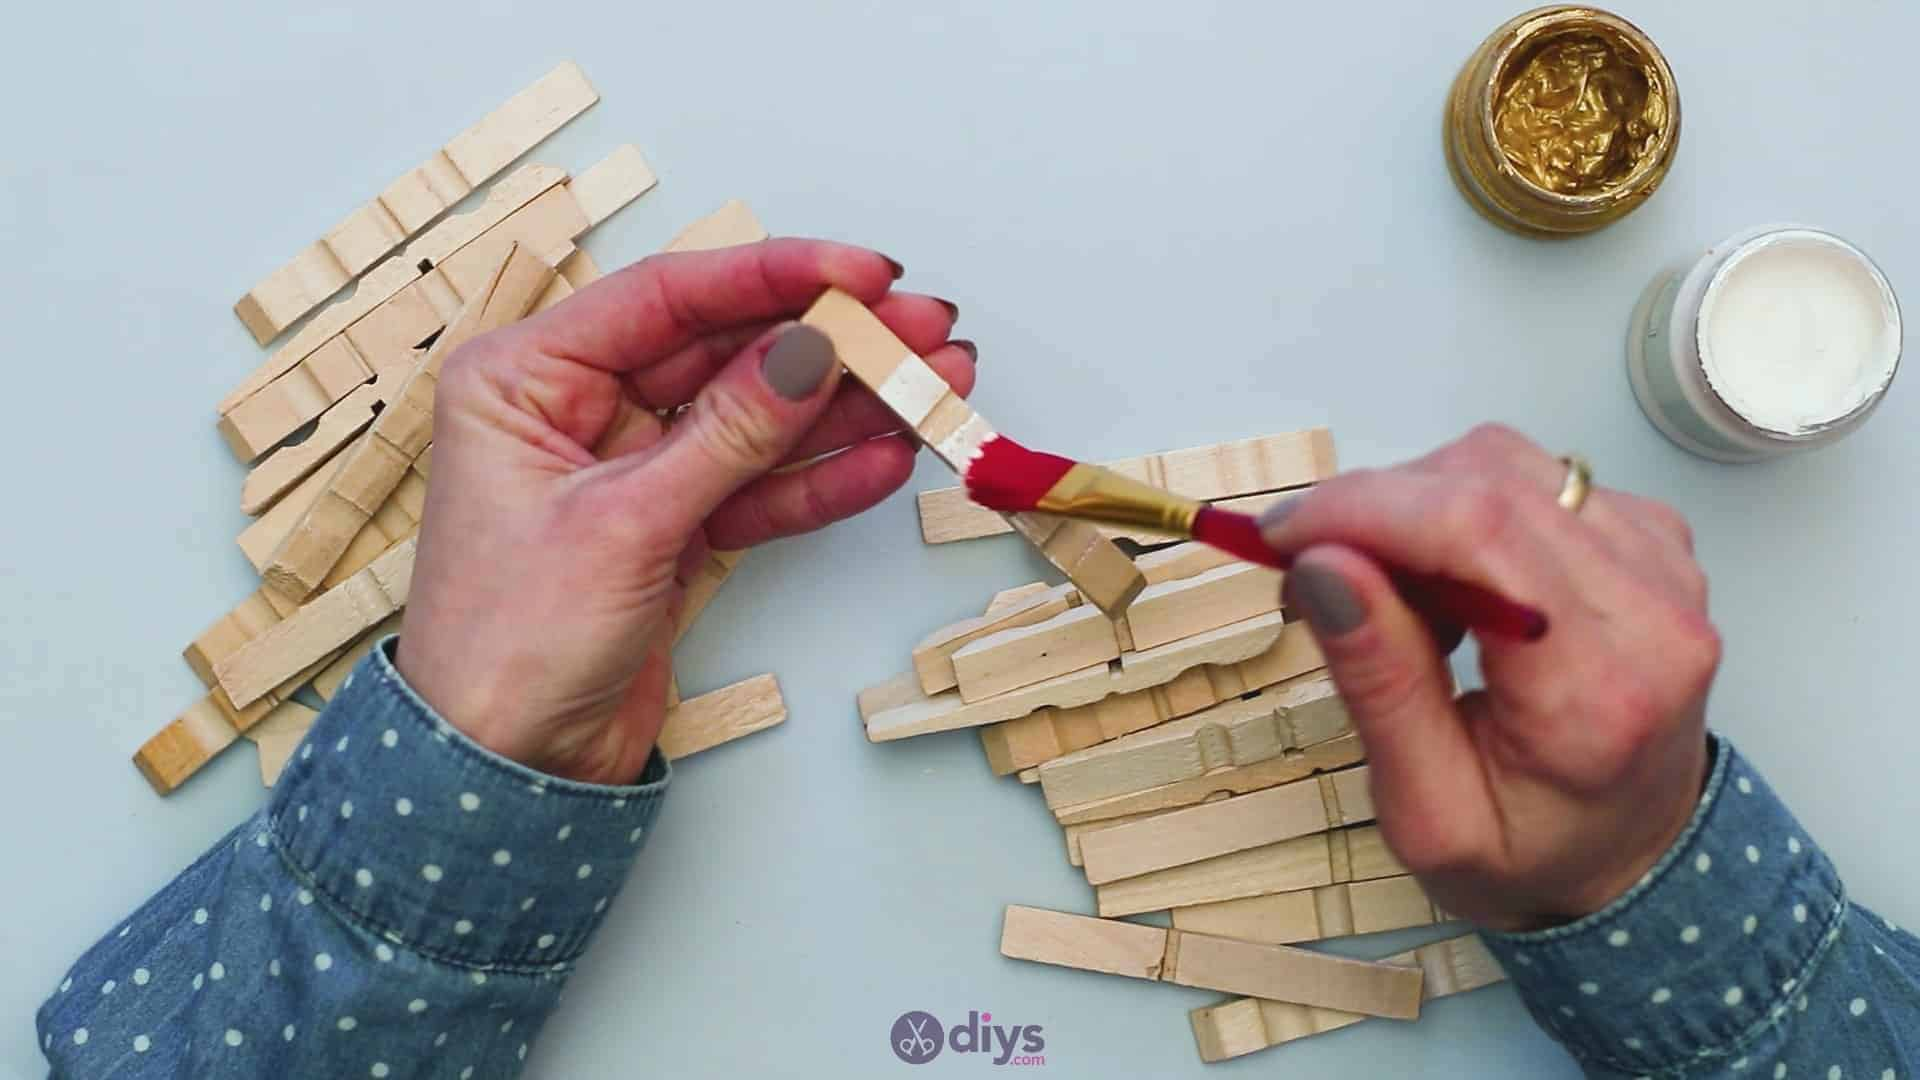 Diy clothespin art step 3a